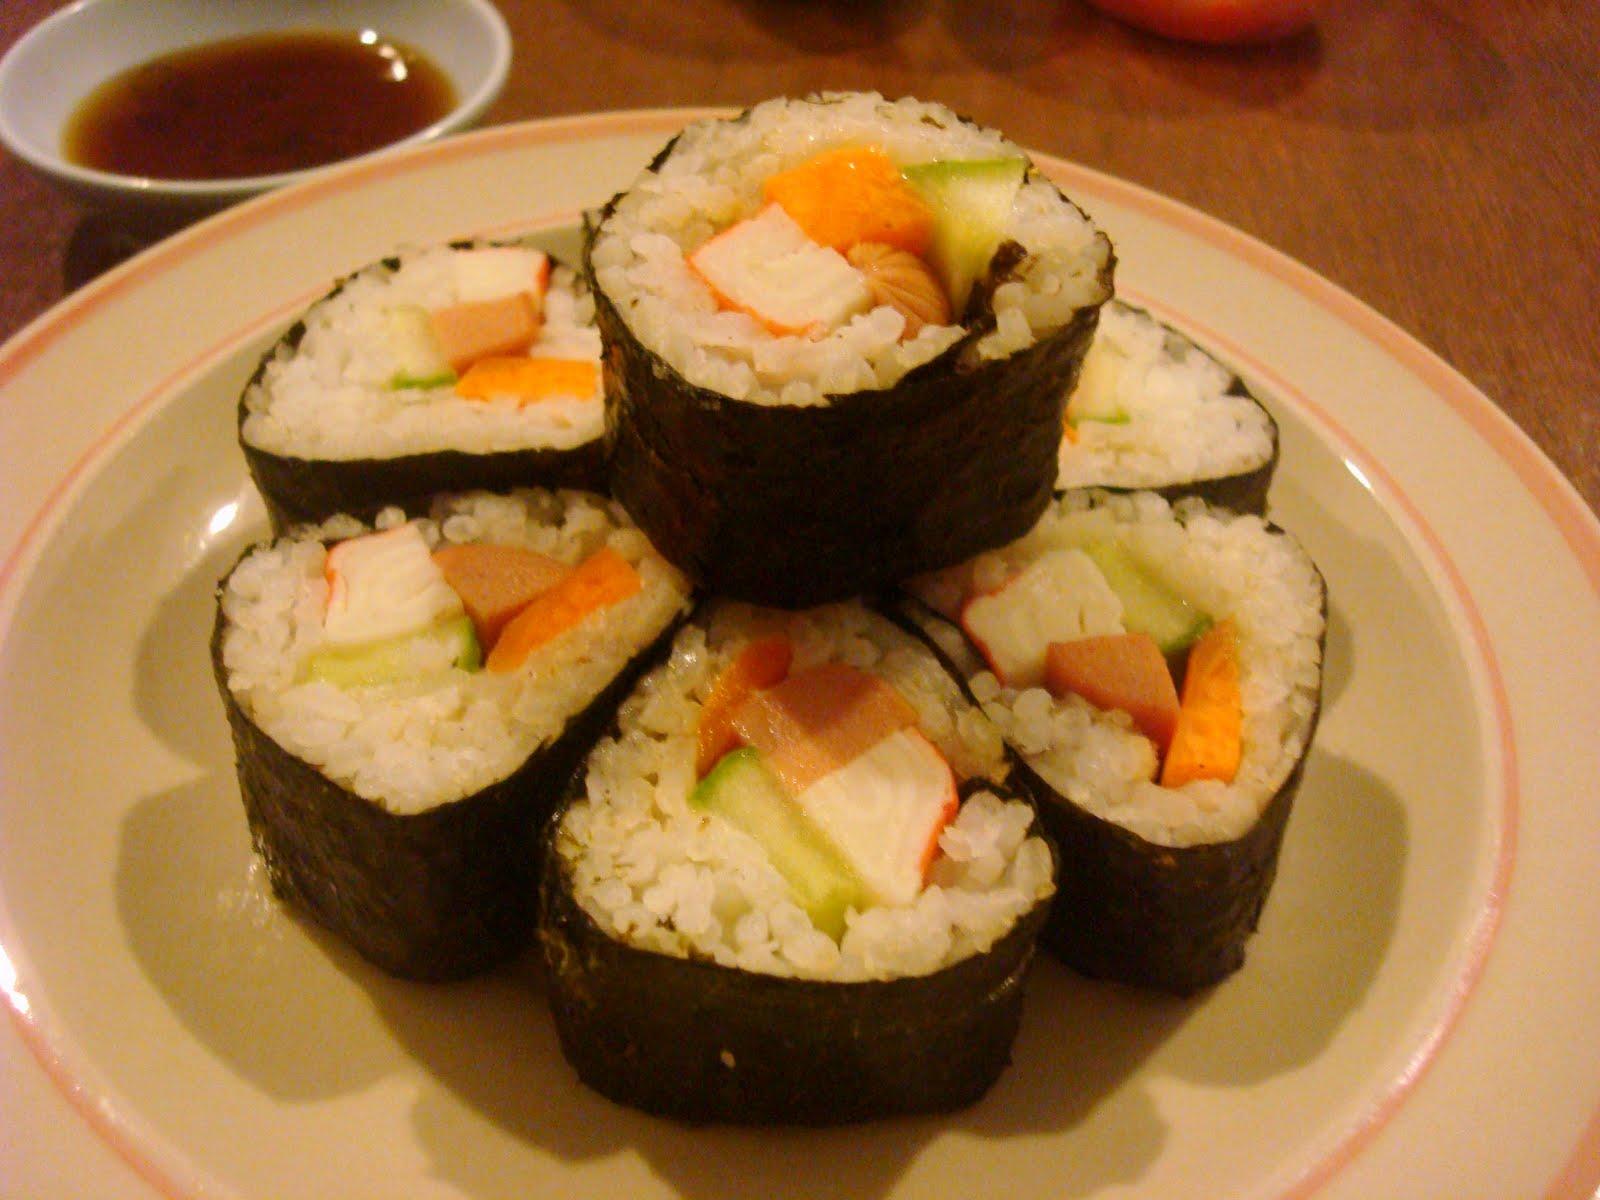 world cuisine maki sushi or sushi rolls in triangle. Black Bedroom Furniture Sets. Home Design Ideas